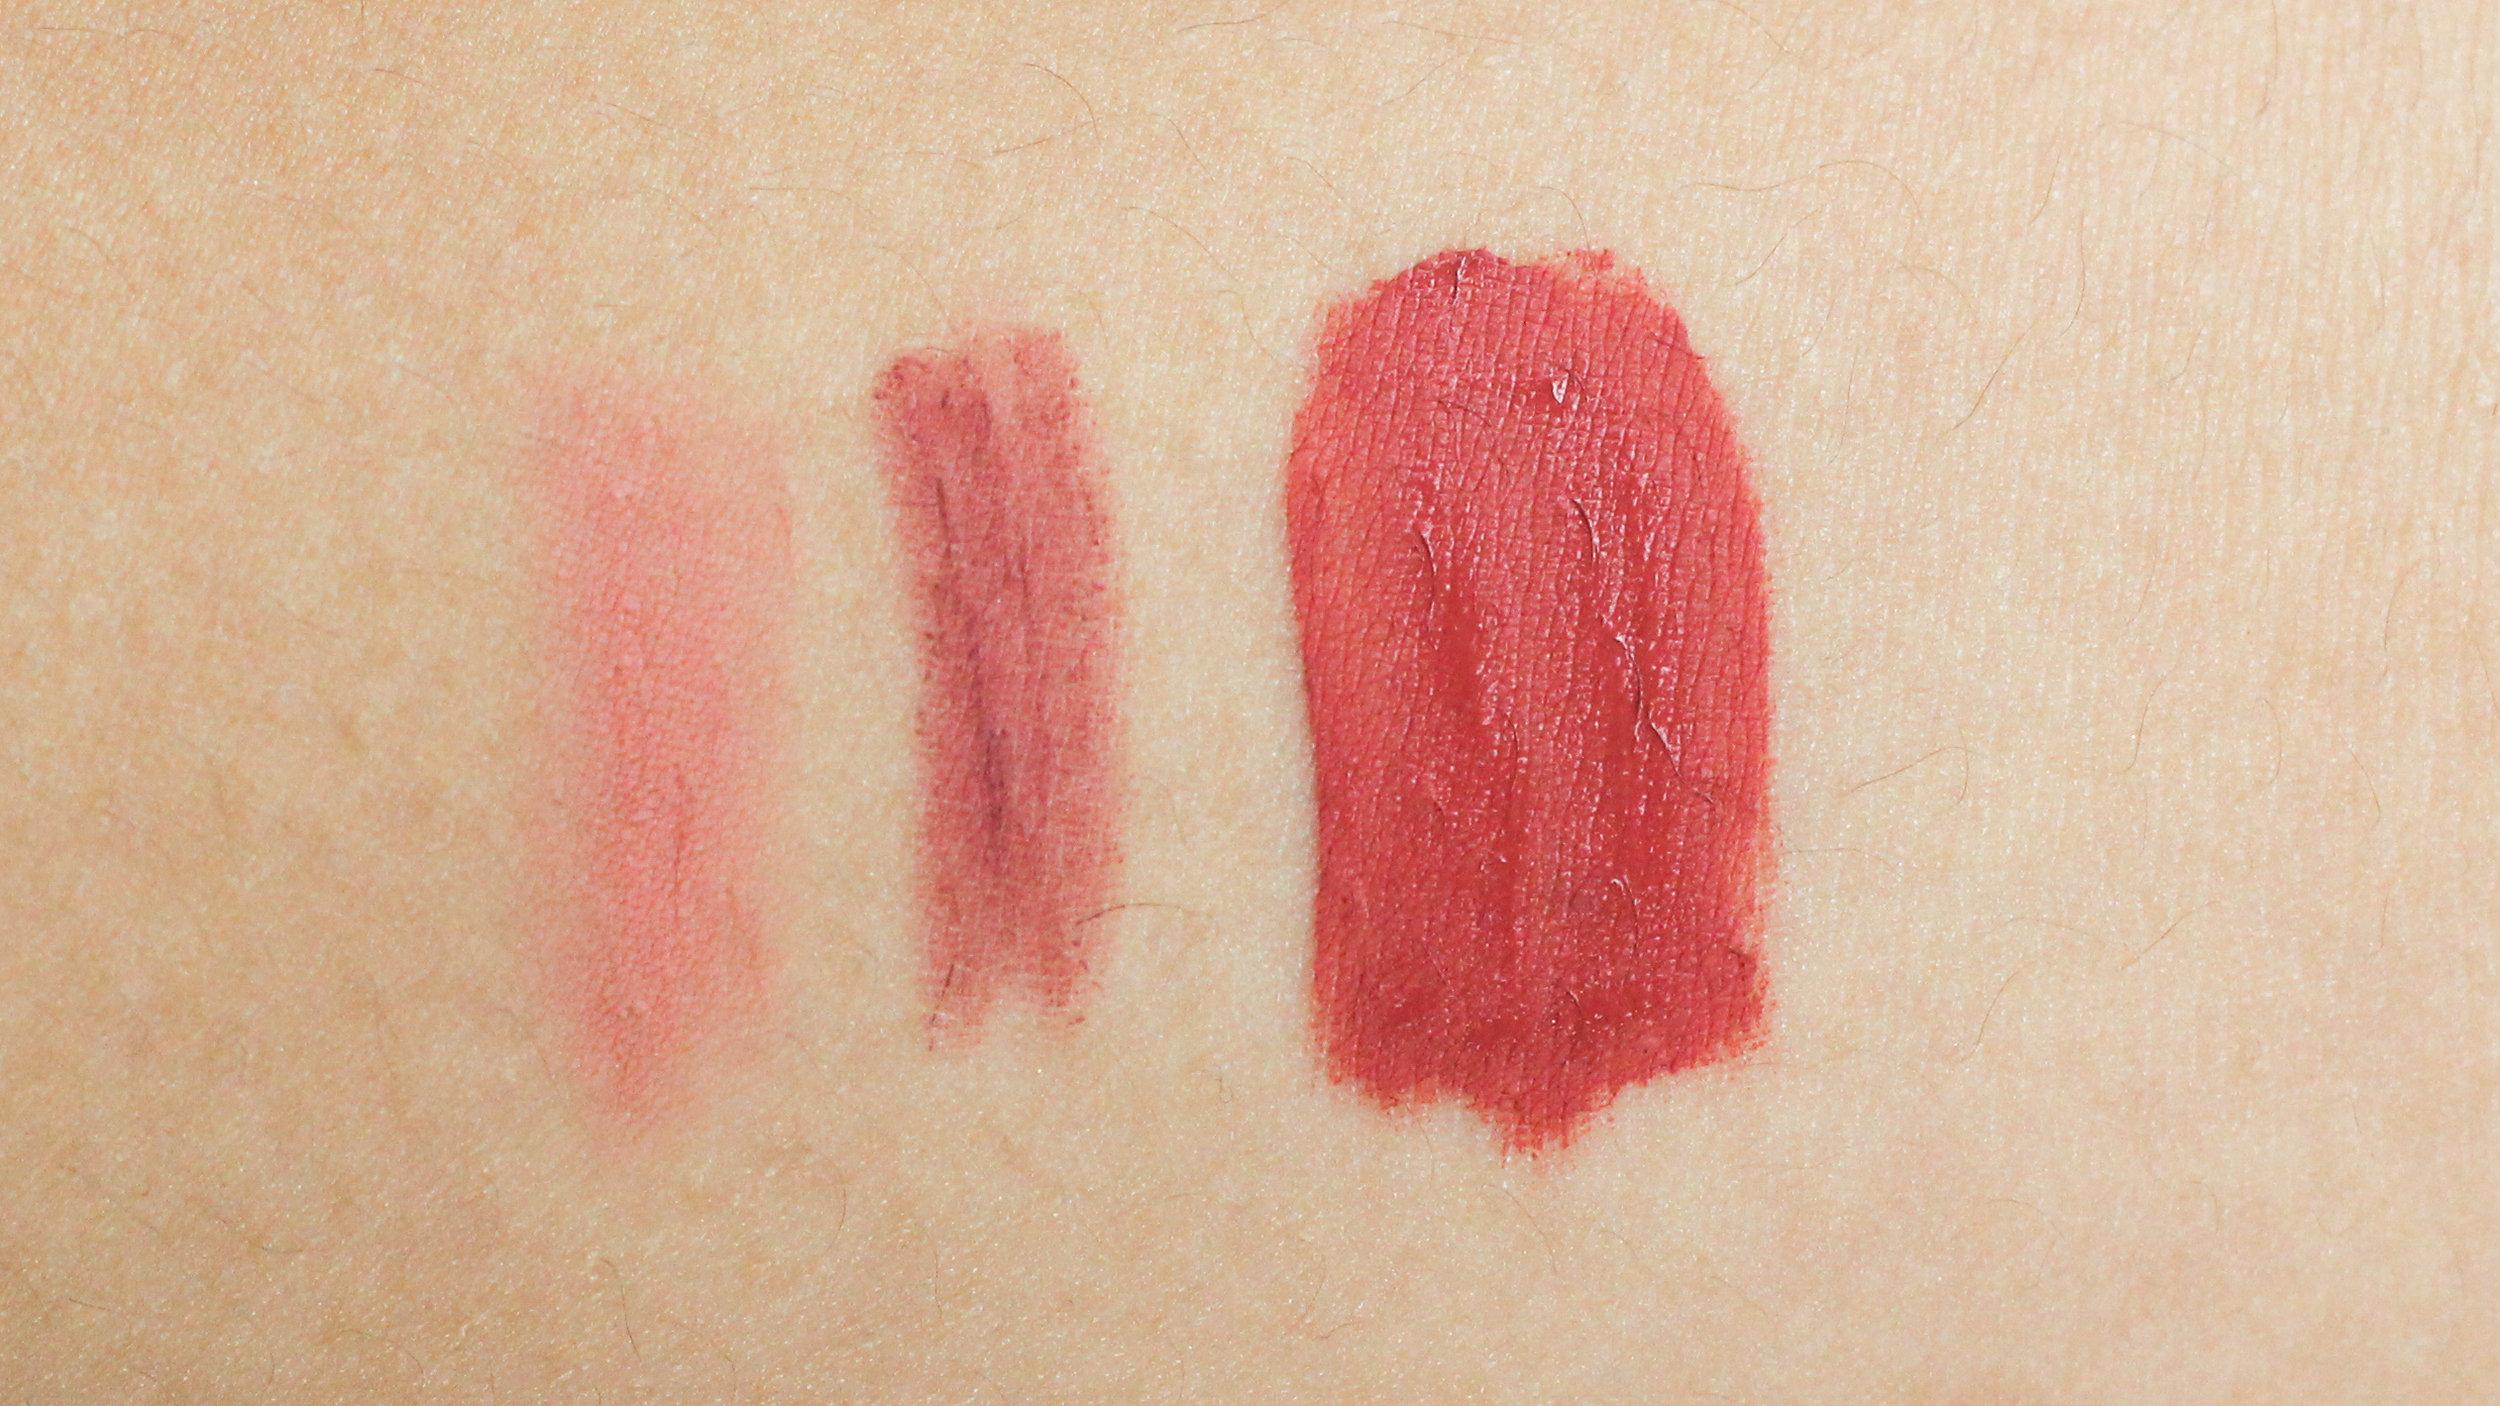 Make Up For Ever Aqua Lip,Happy Skin Shut Up & Kiss Me Moisturizing Matte Lip Liner in First Date,Rire Lip Manicure in Pink Brown